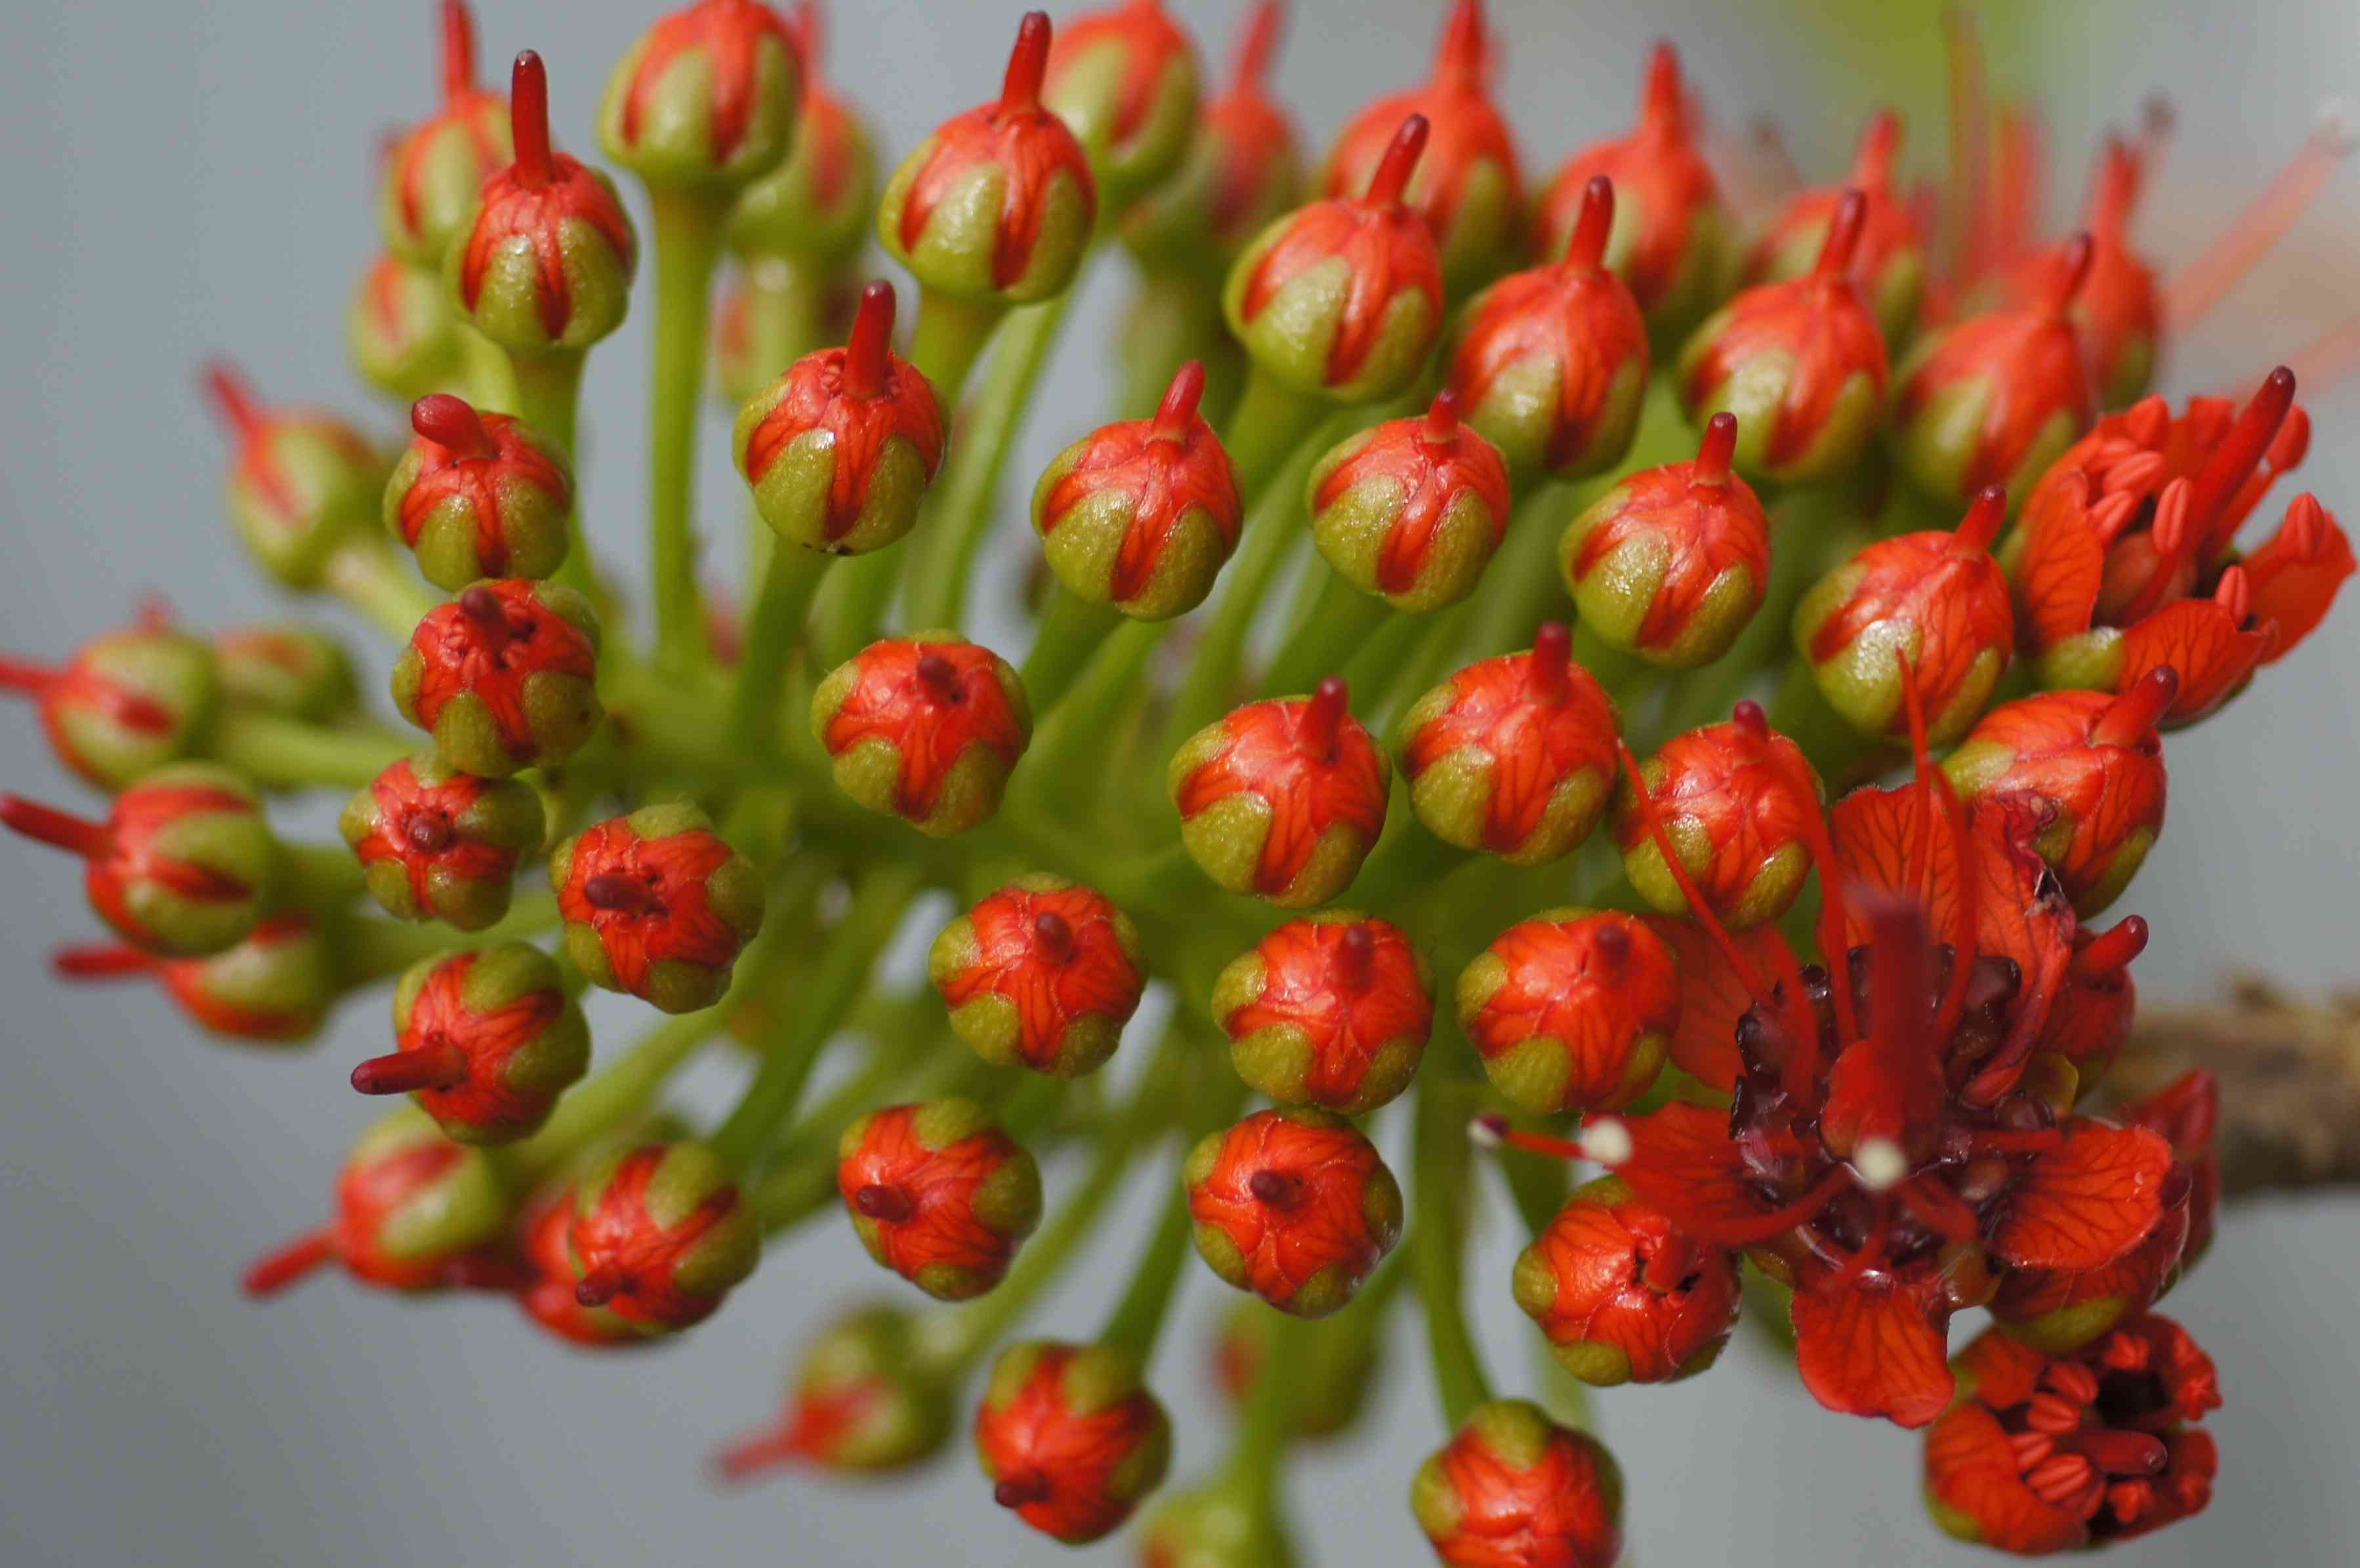 Pagoda plant (Clerodendrum paniculatum) buds